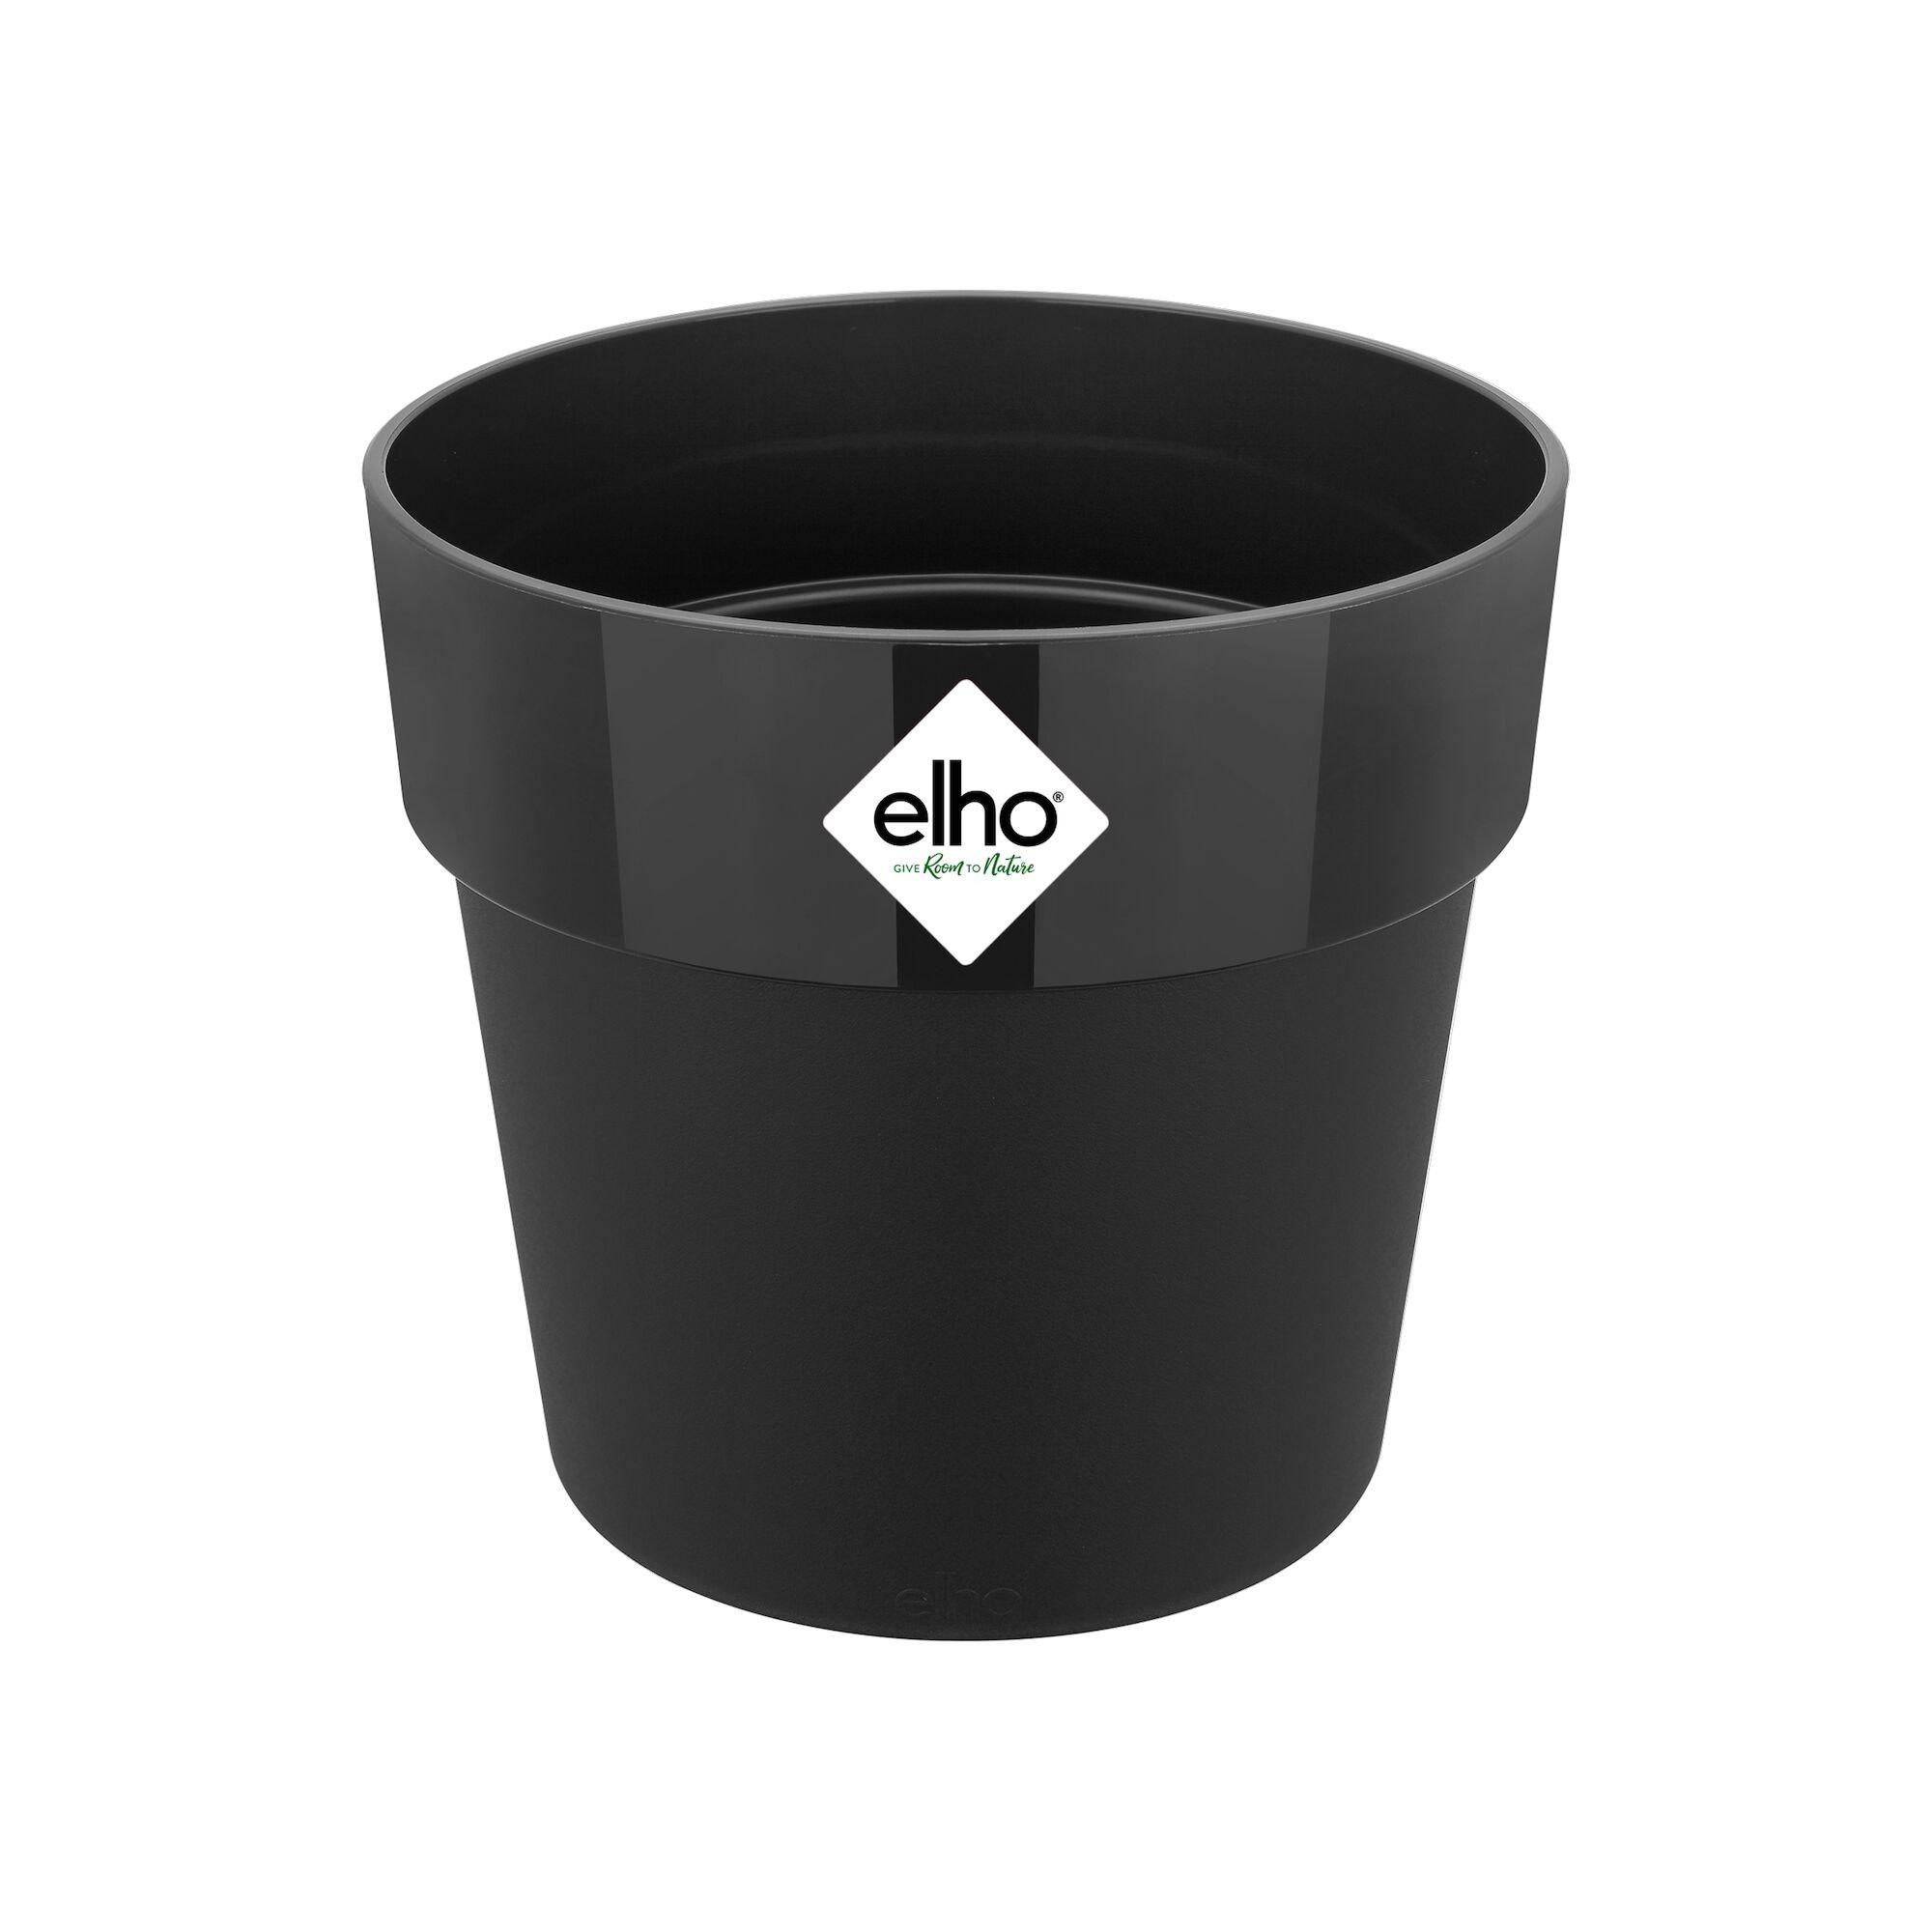 B.for original round mini 9 liv black